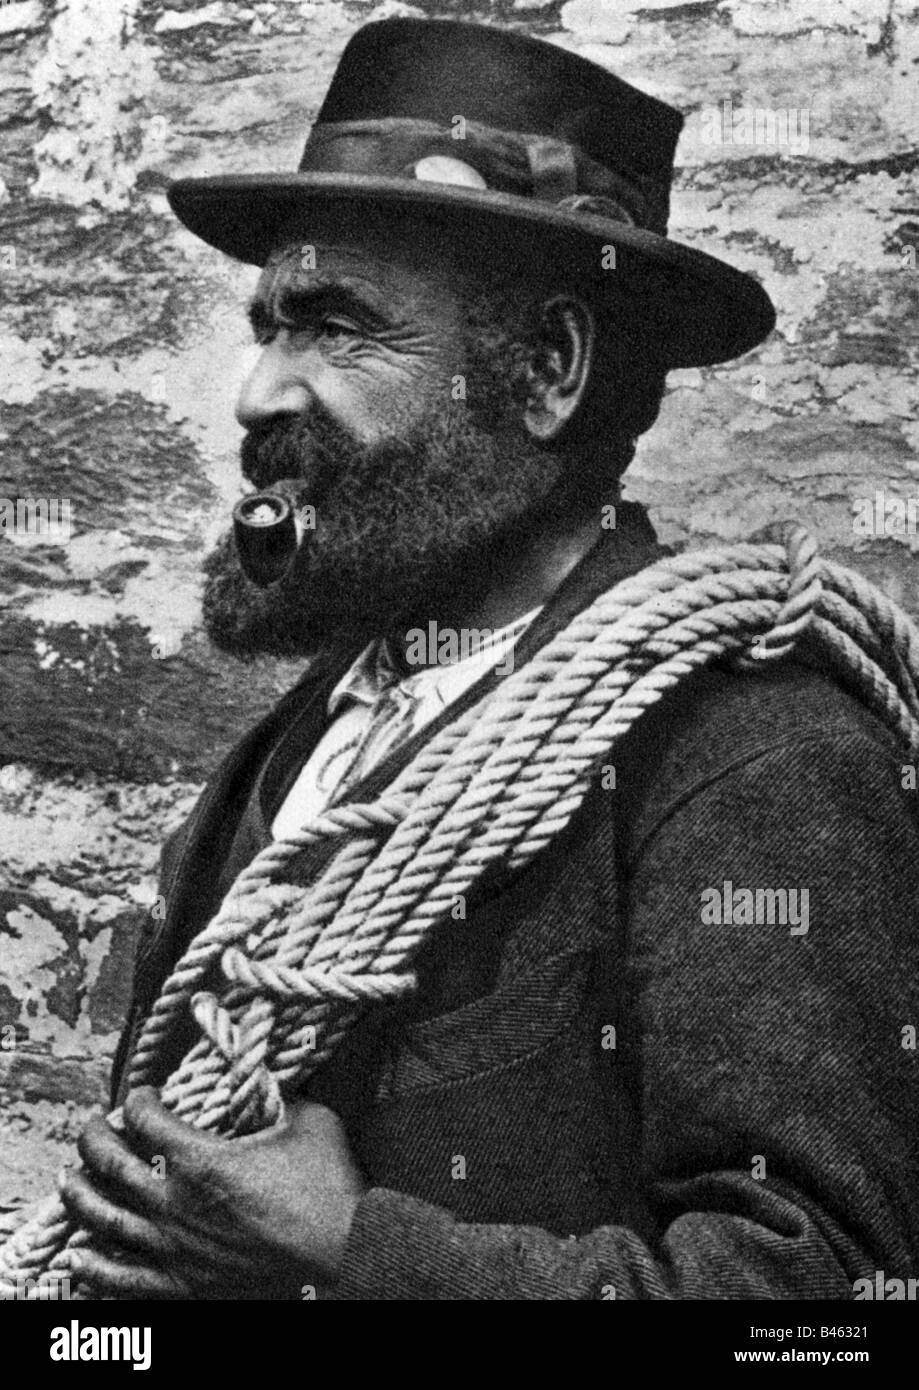 Guides de montagne, alpinisme, Alexandre Burgener, 1846 - 1910, Eisten, Saasertal, photogravure, 1938, alpiniste, Photo Stock